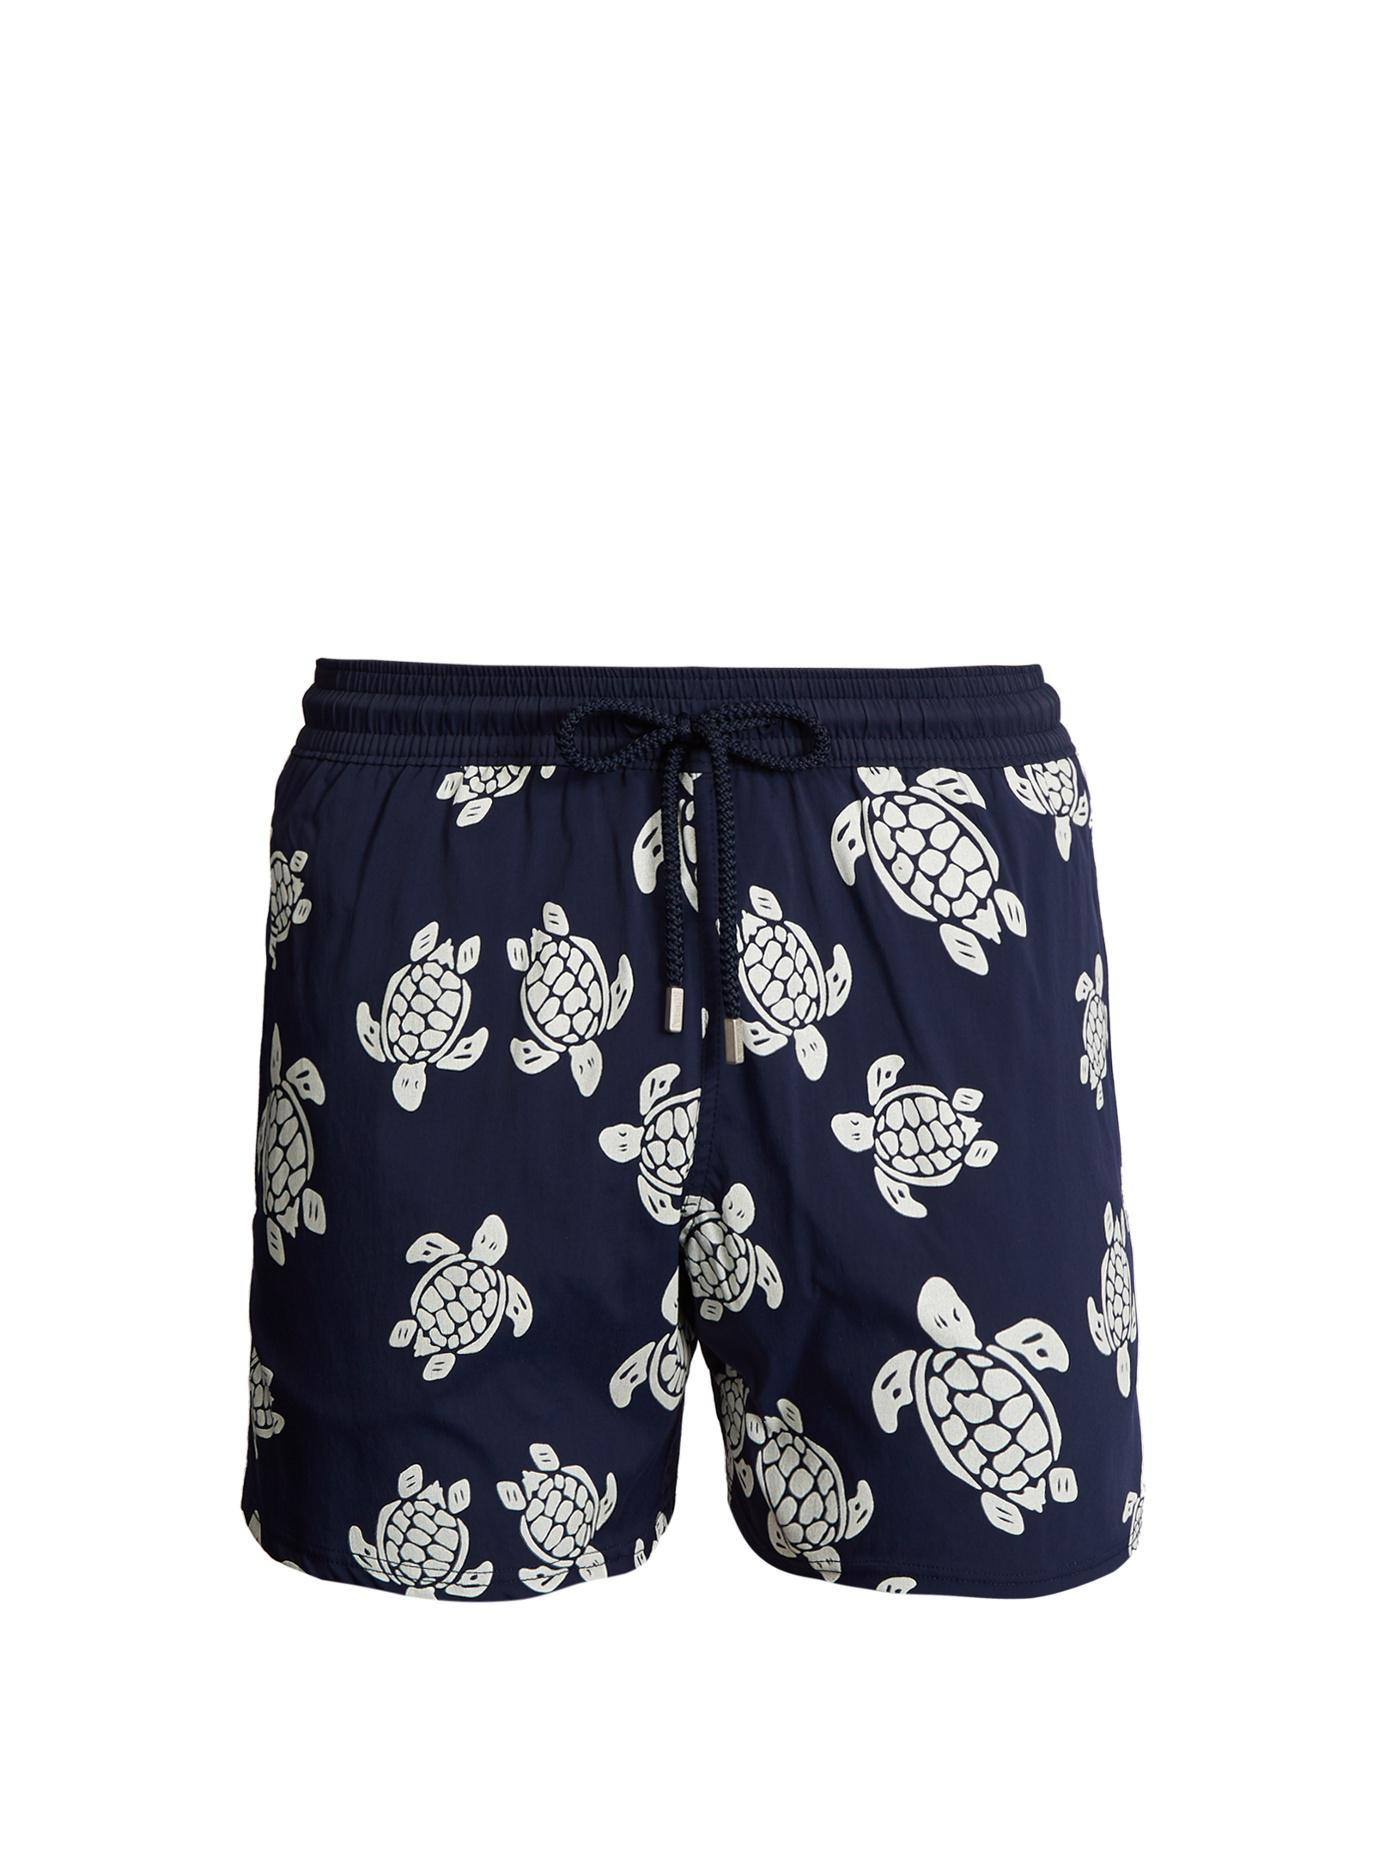 5b0541f39ecc6 Vilebrequin Moorea Glow-in-the-dark Turtles-print Swim Shorts in ...